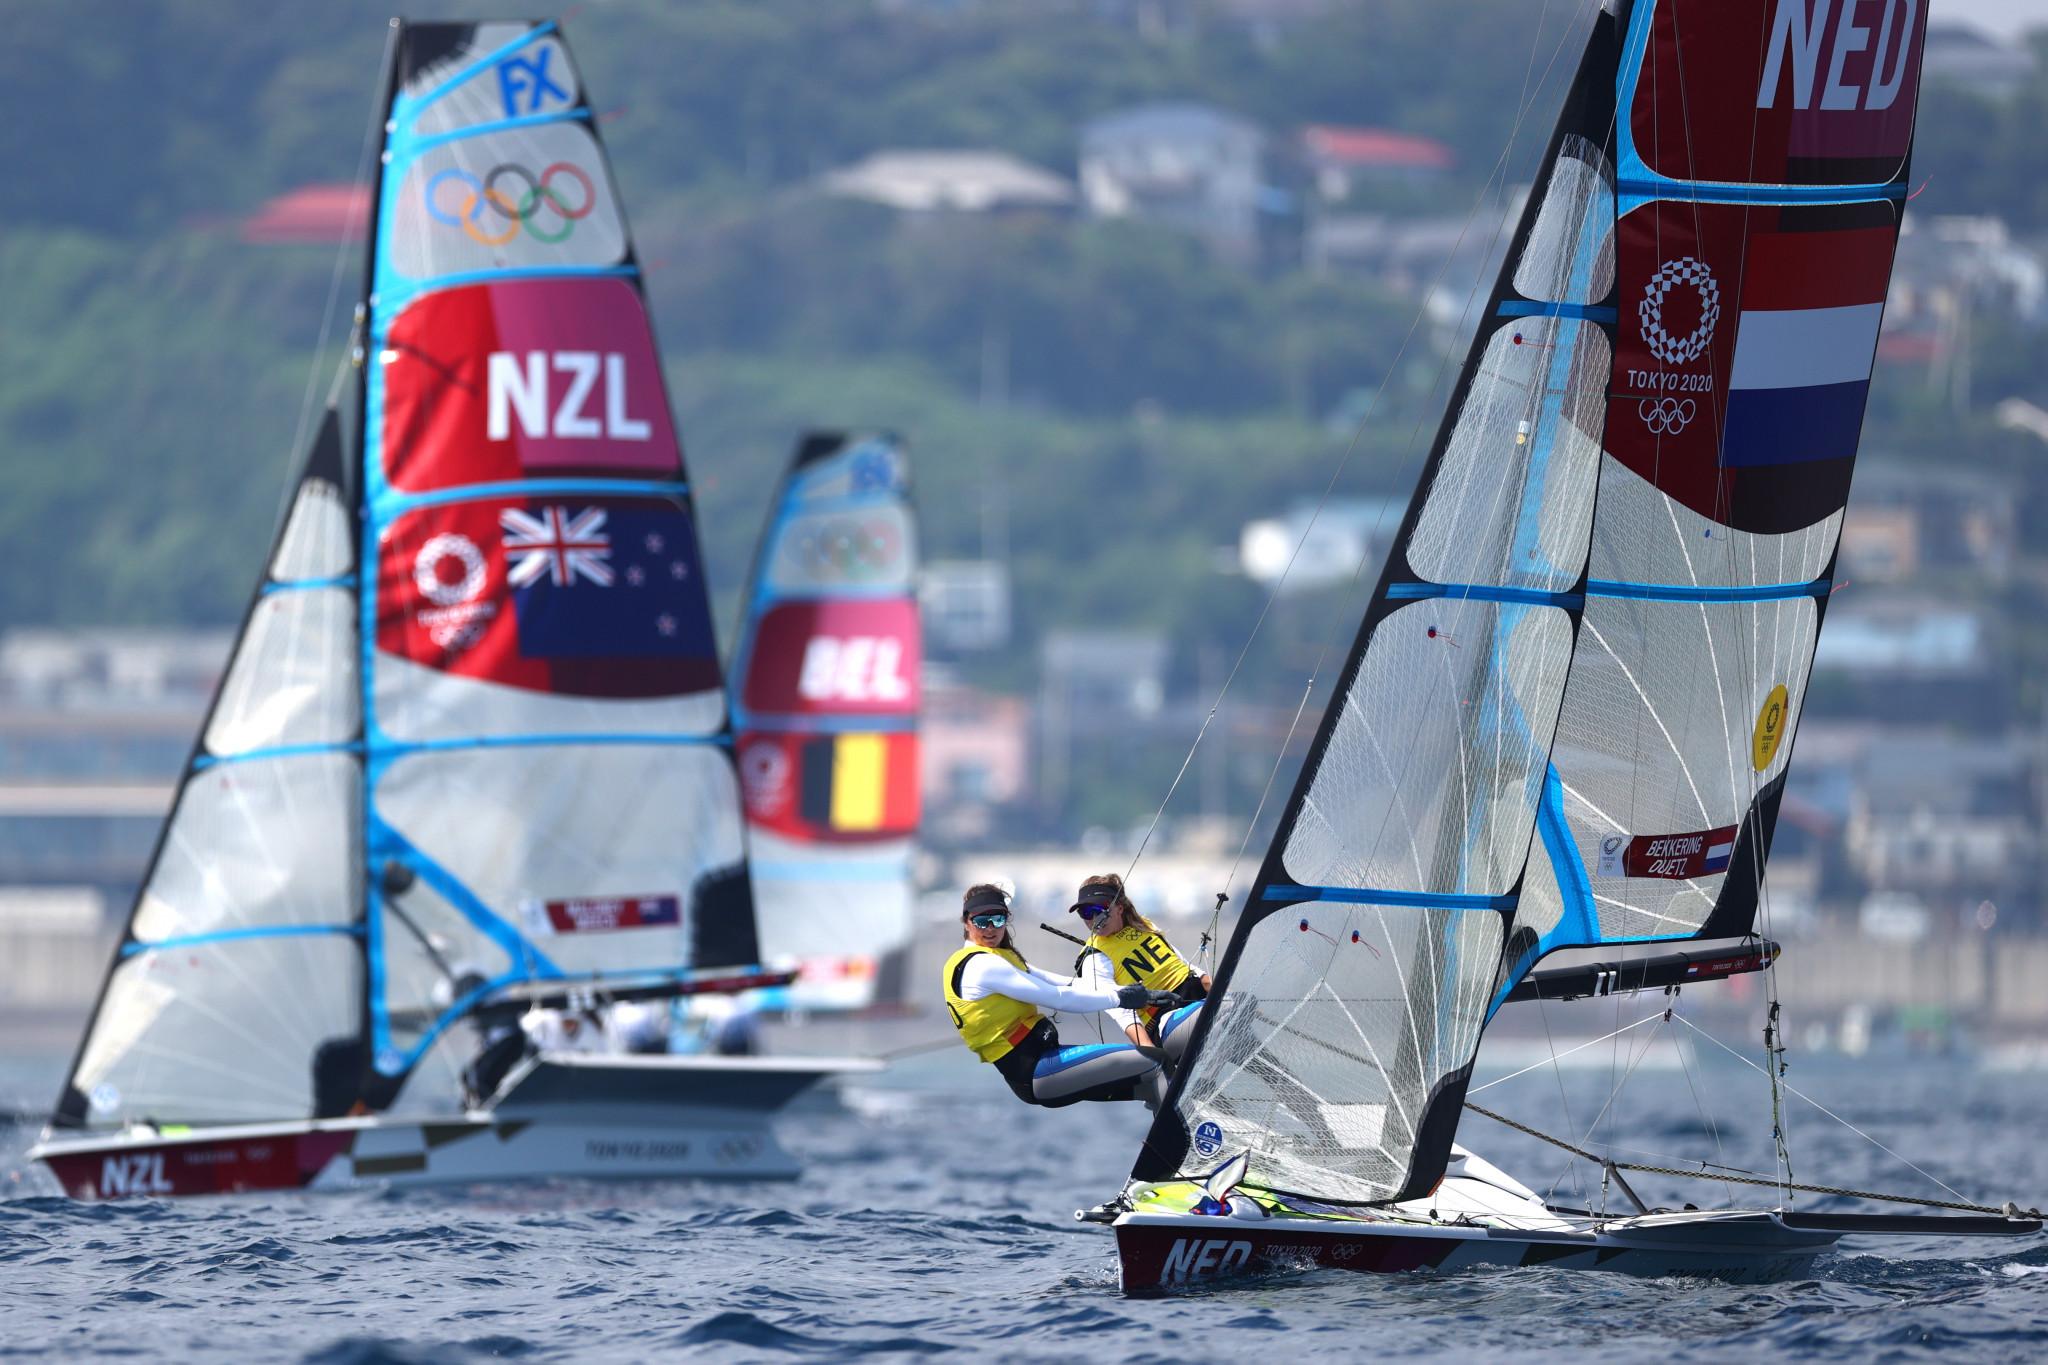 Dutch duo take lead in European 49erFX Championships as Malta suffer horrendous day